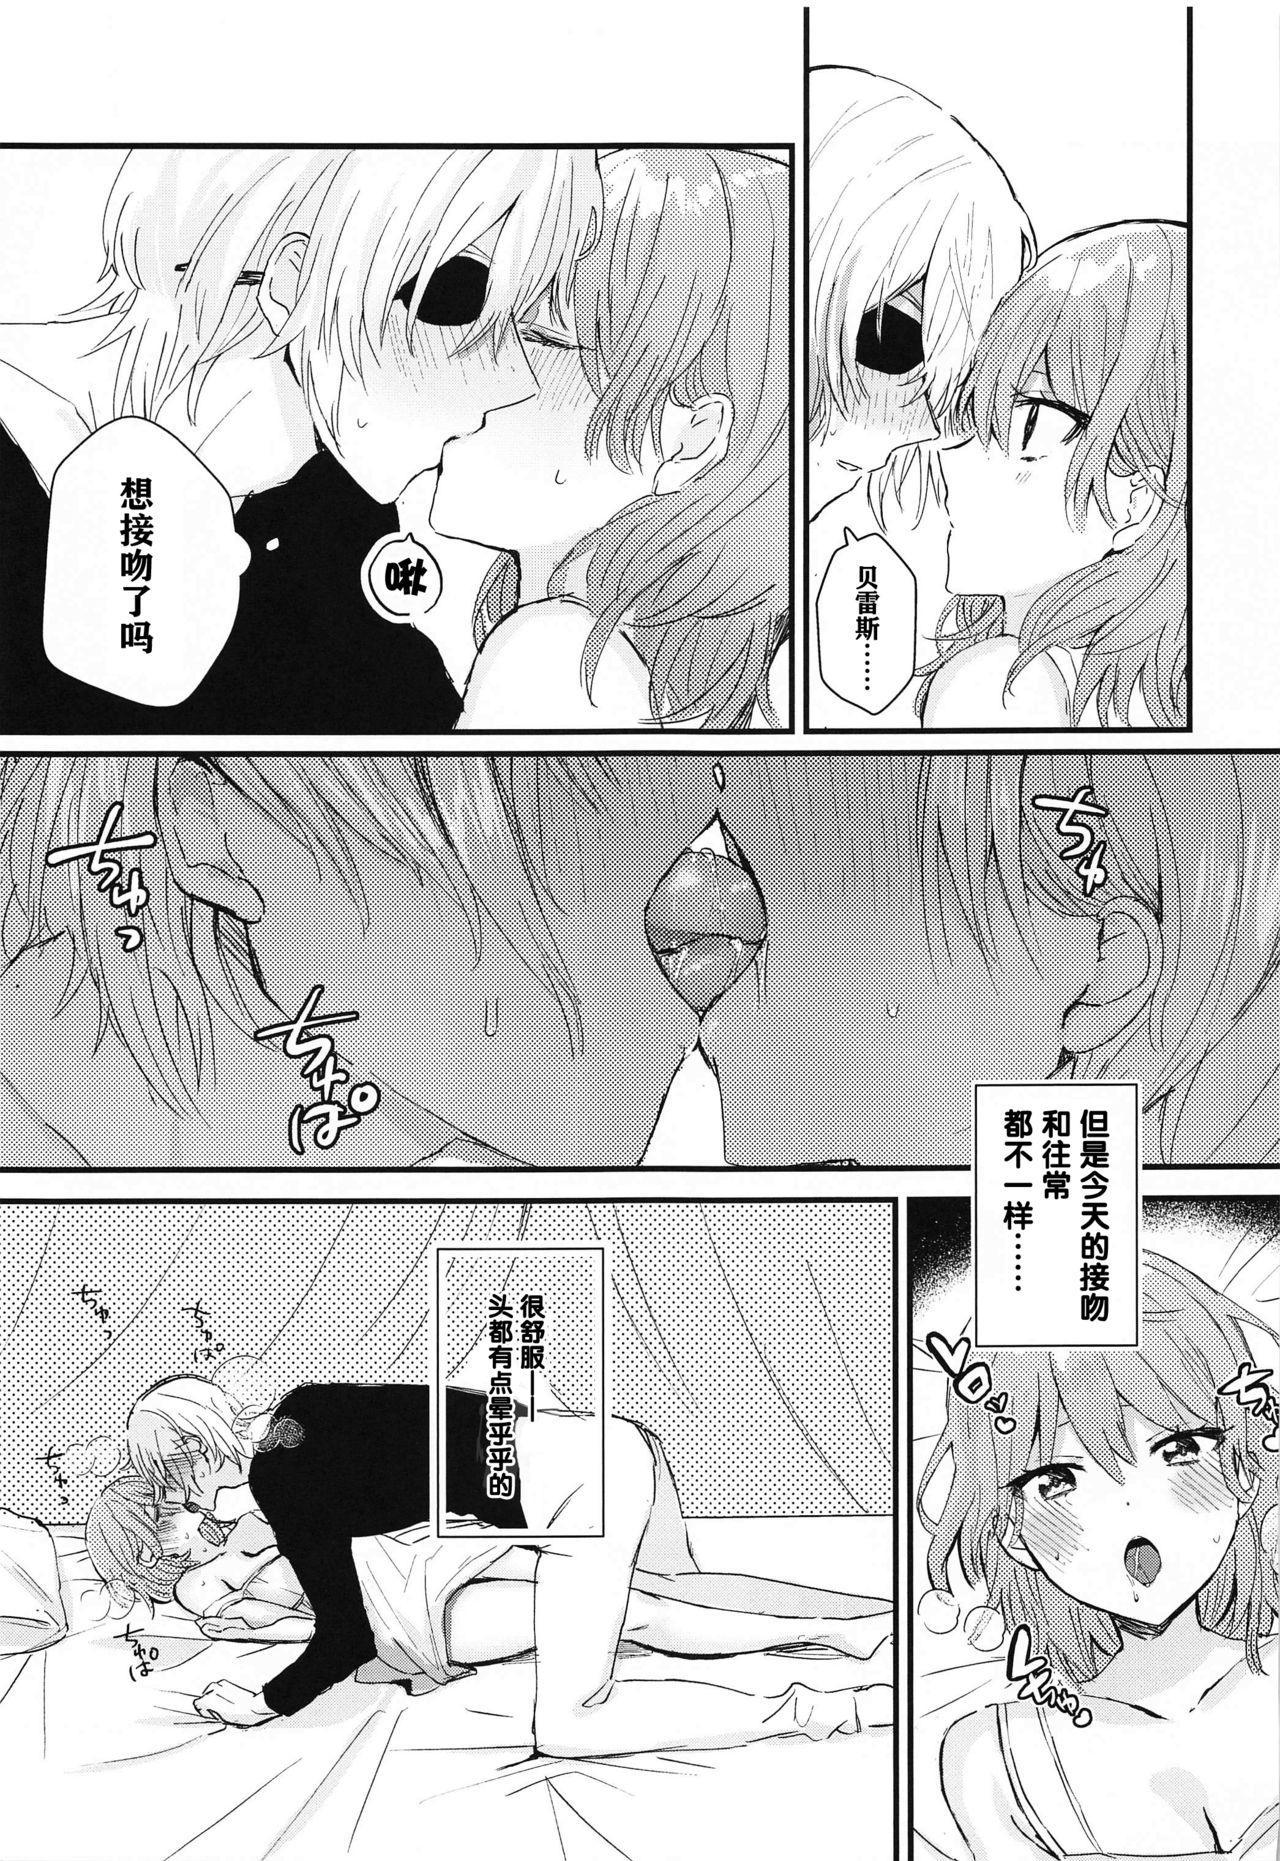 Sensei no Hatena - What the professor doesn't know 6